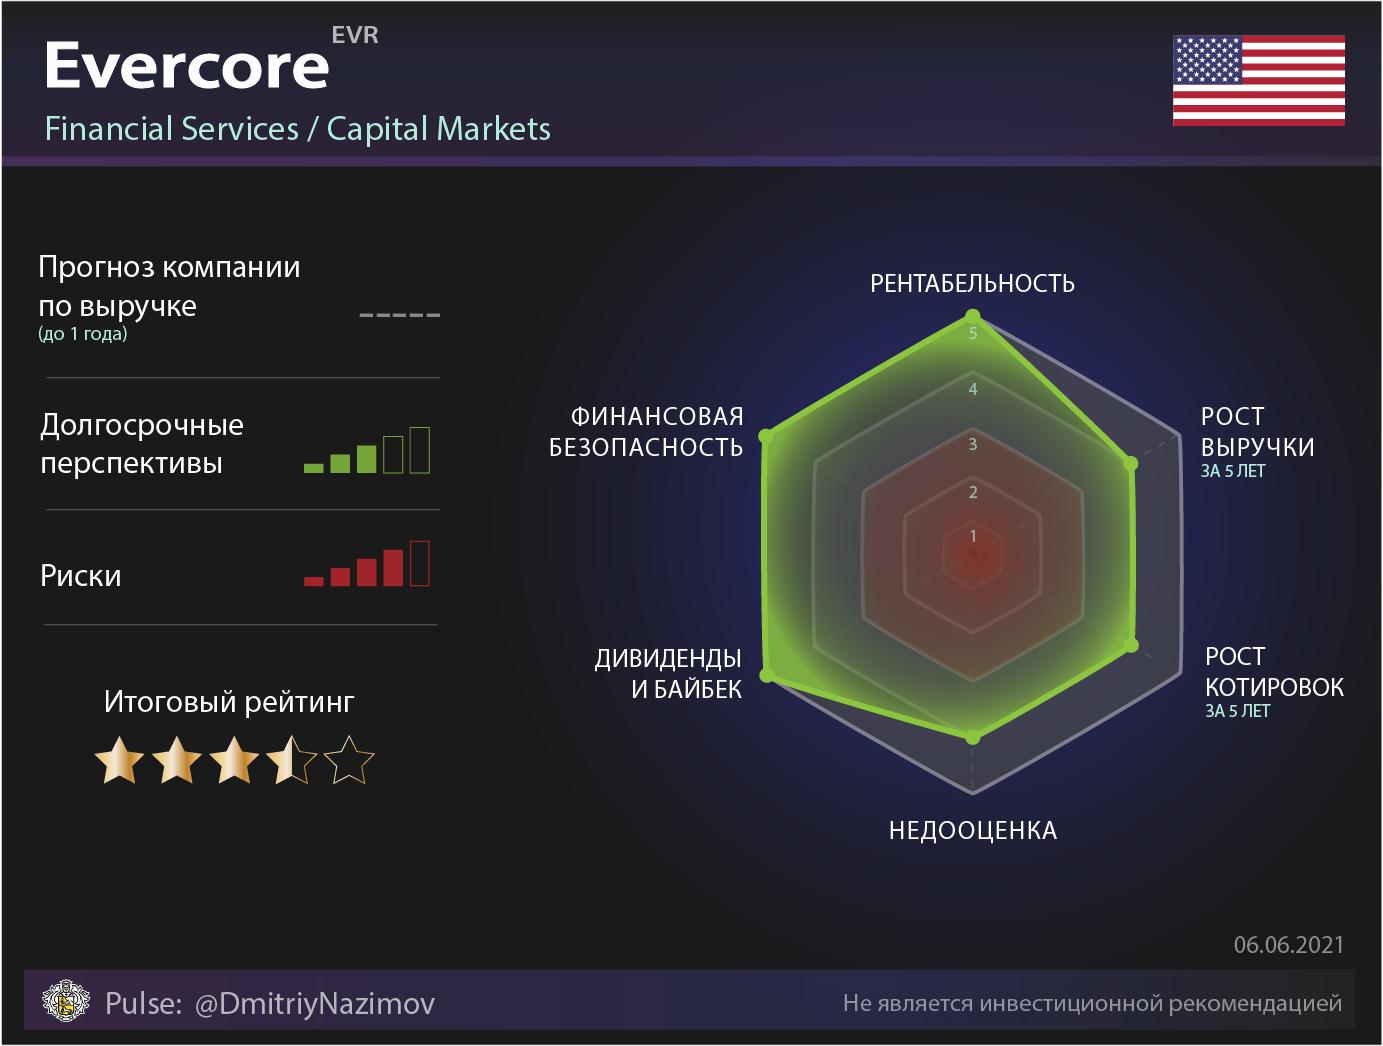 Обзор компании Evercore без шелухи